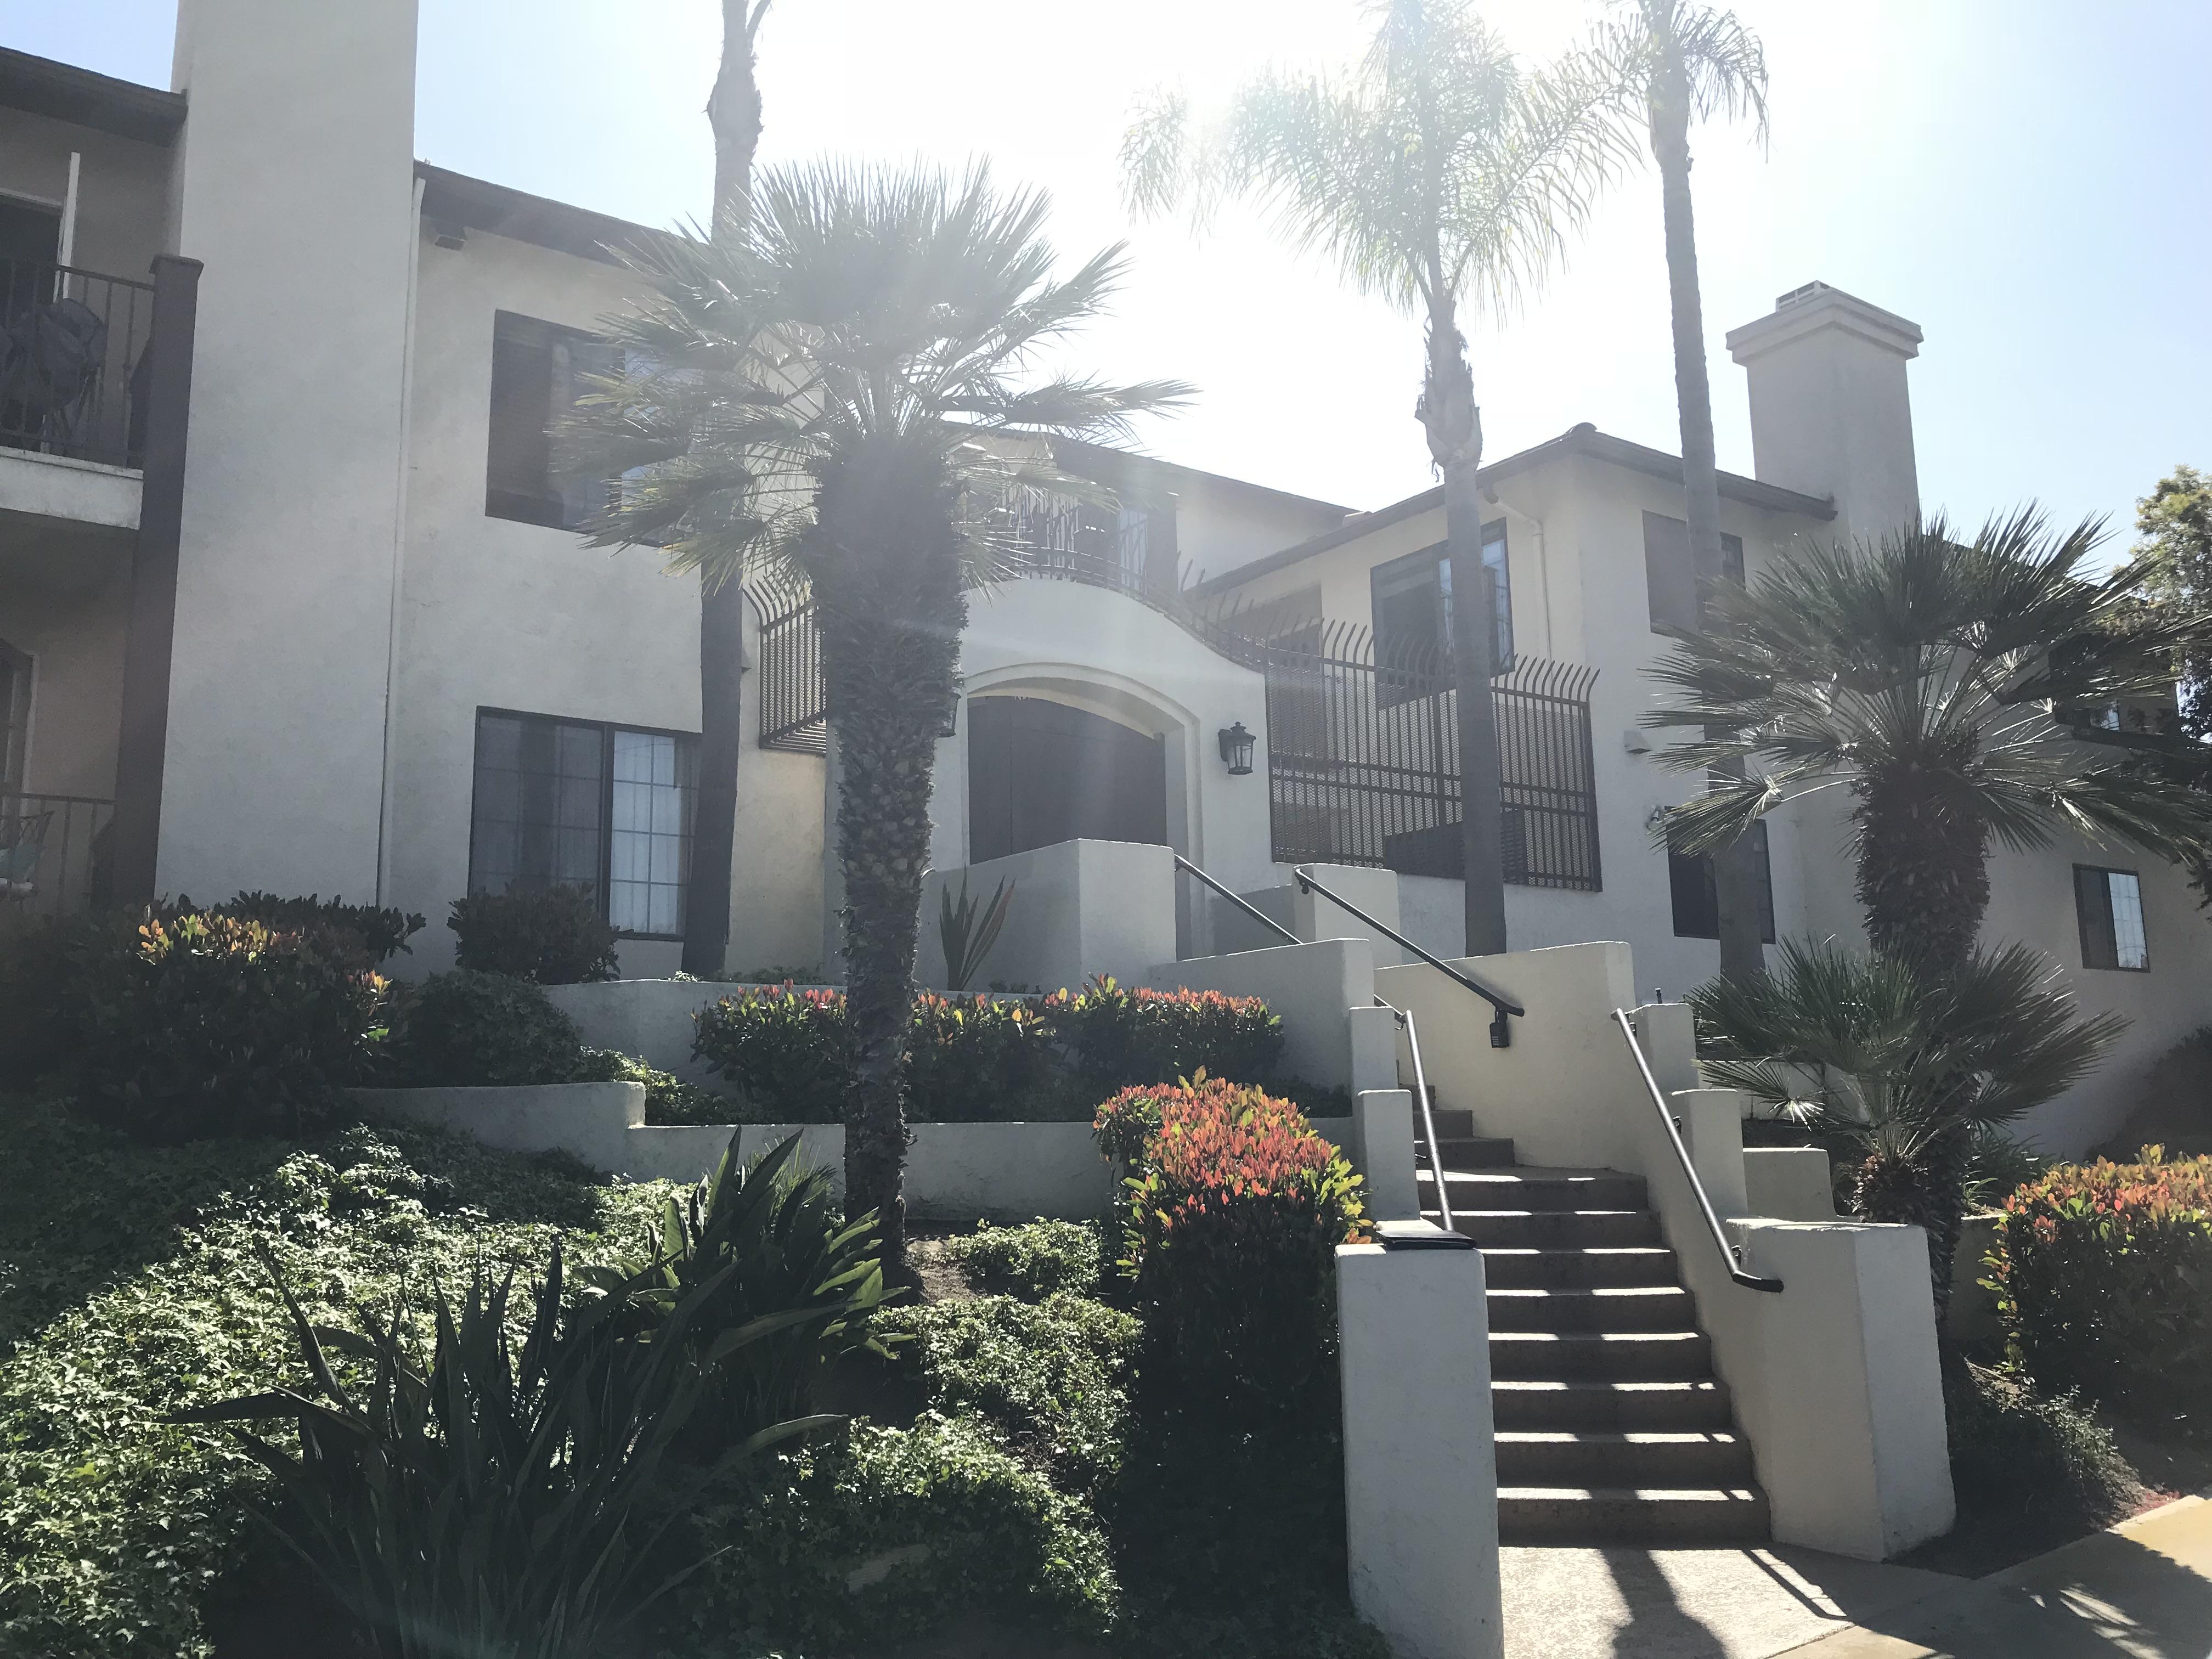 2828 Famosa Blvd Unit #307, San Diego, CA 92107